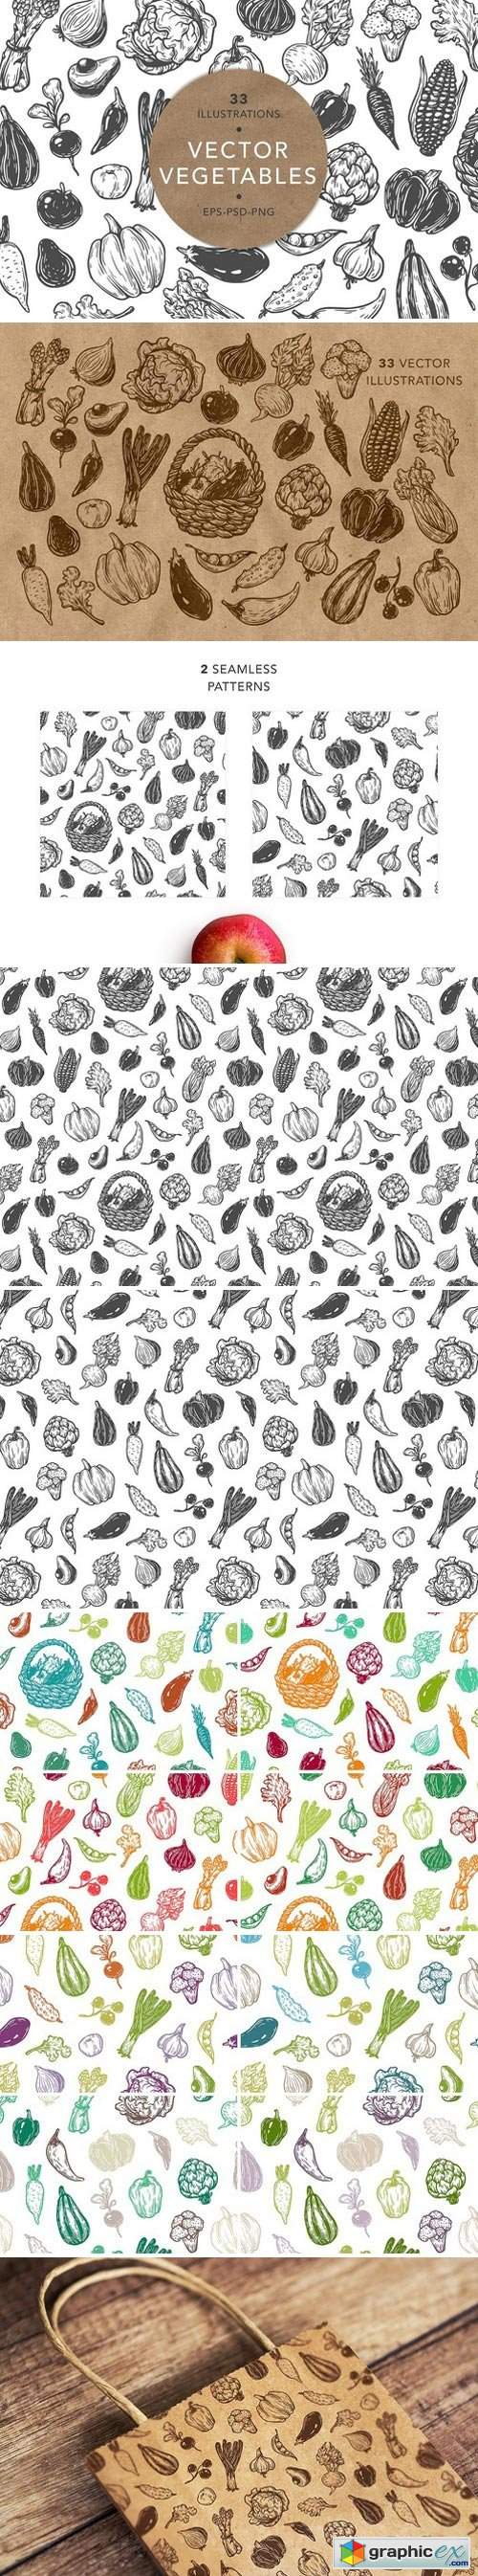 Vector Vegetables. Illustrations.